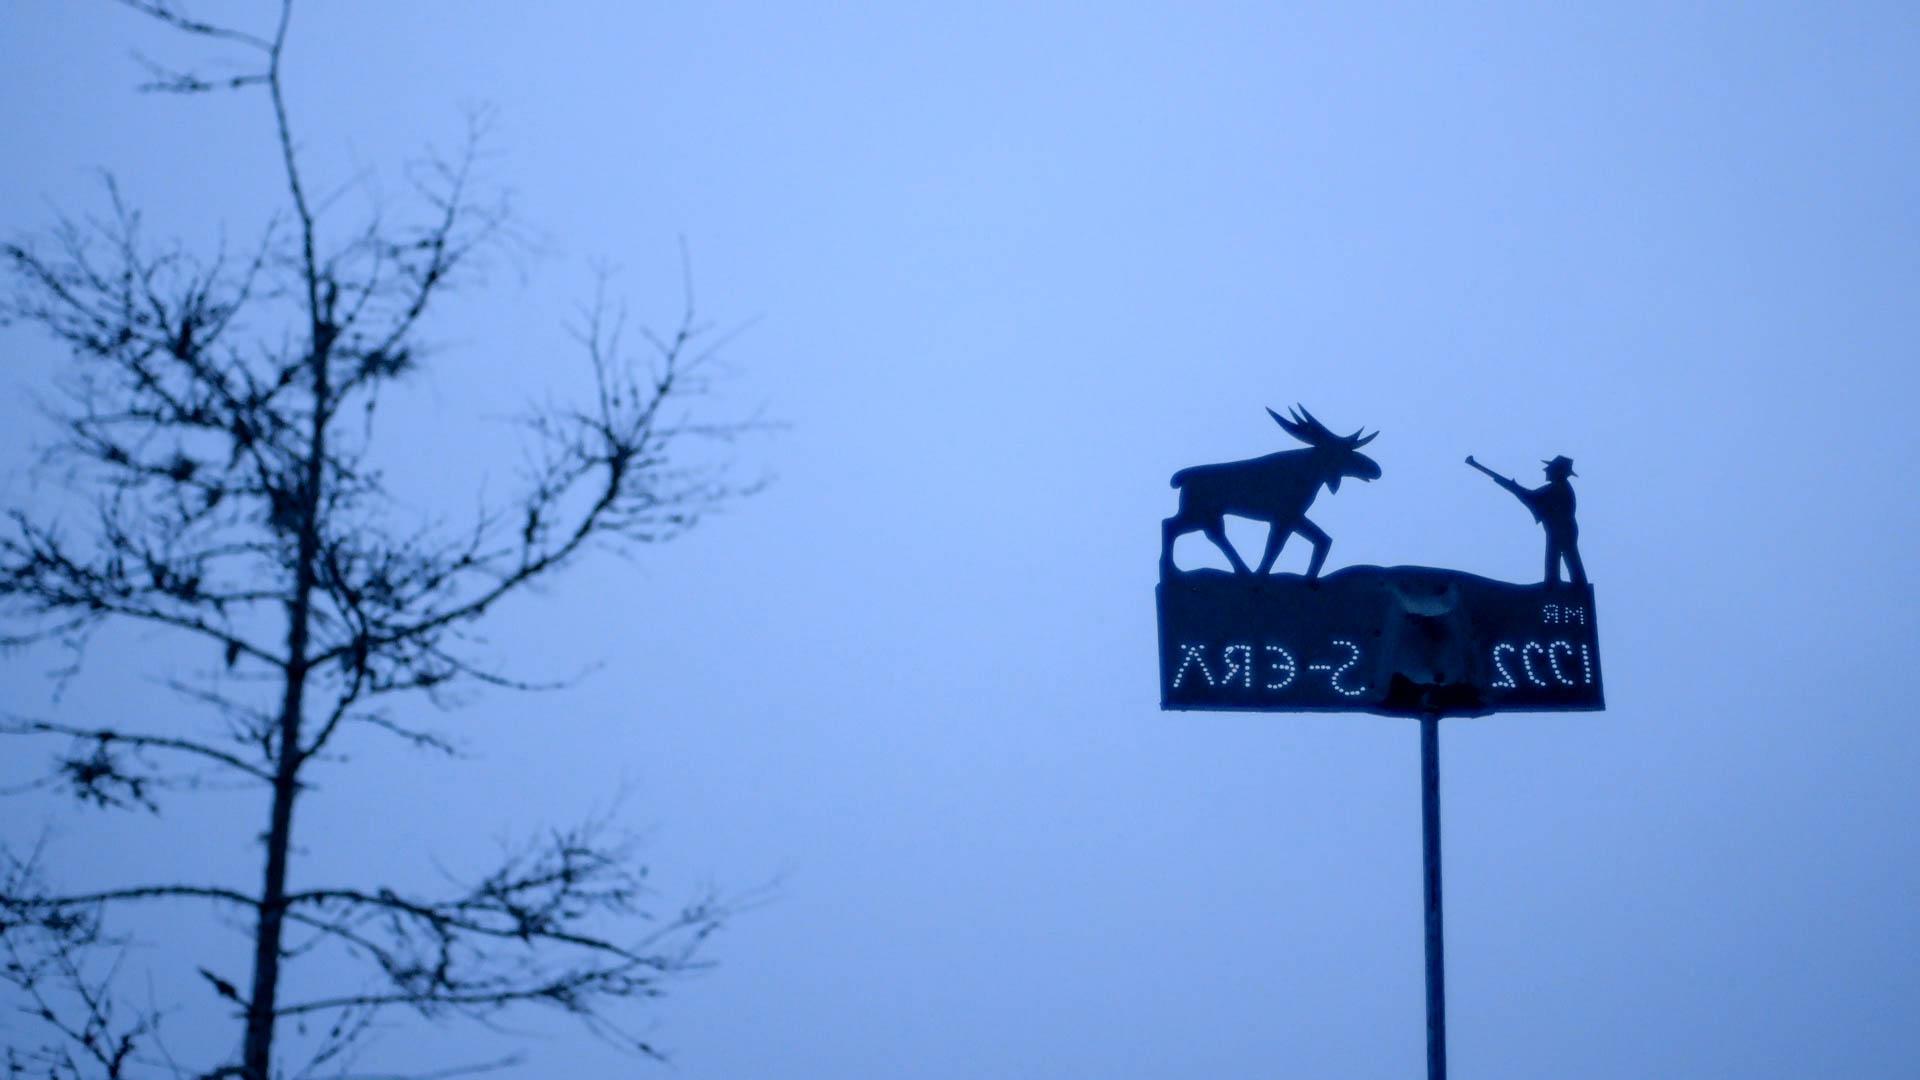 Outside the hunting cabin, Selkie village - still, Tom Miller